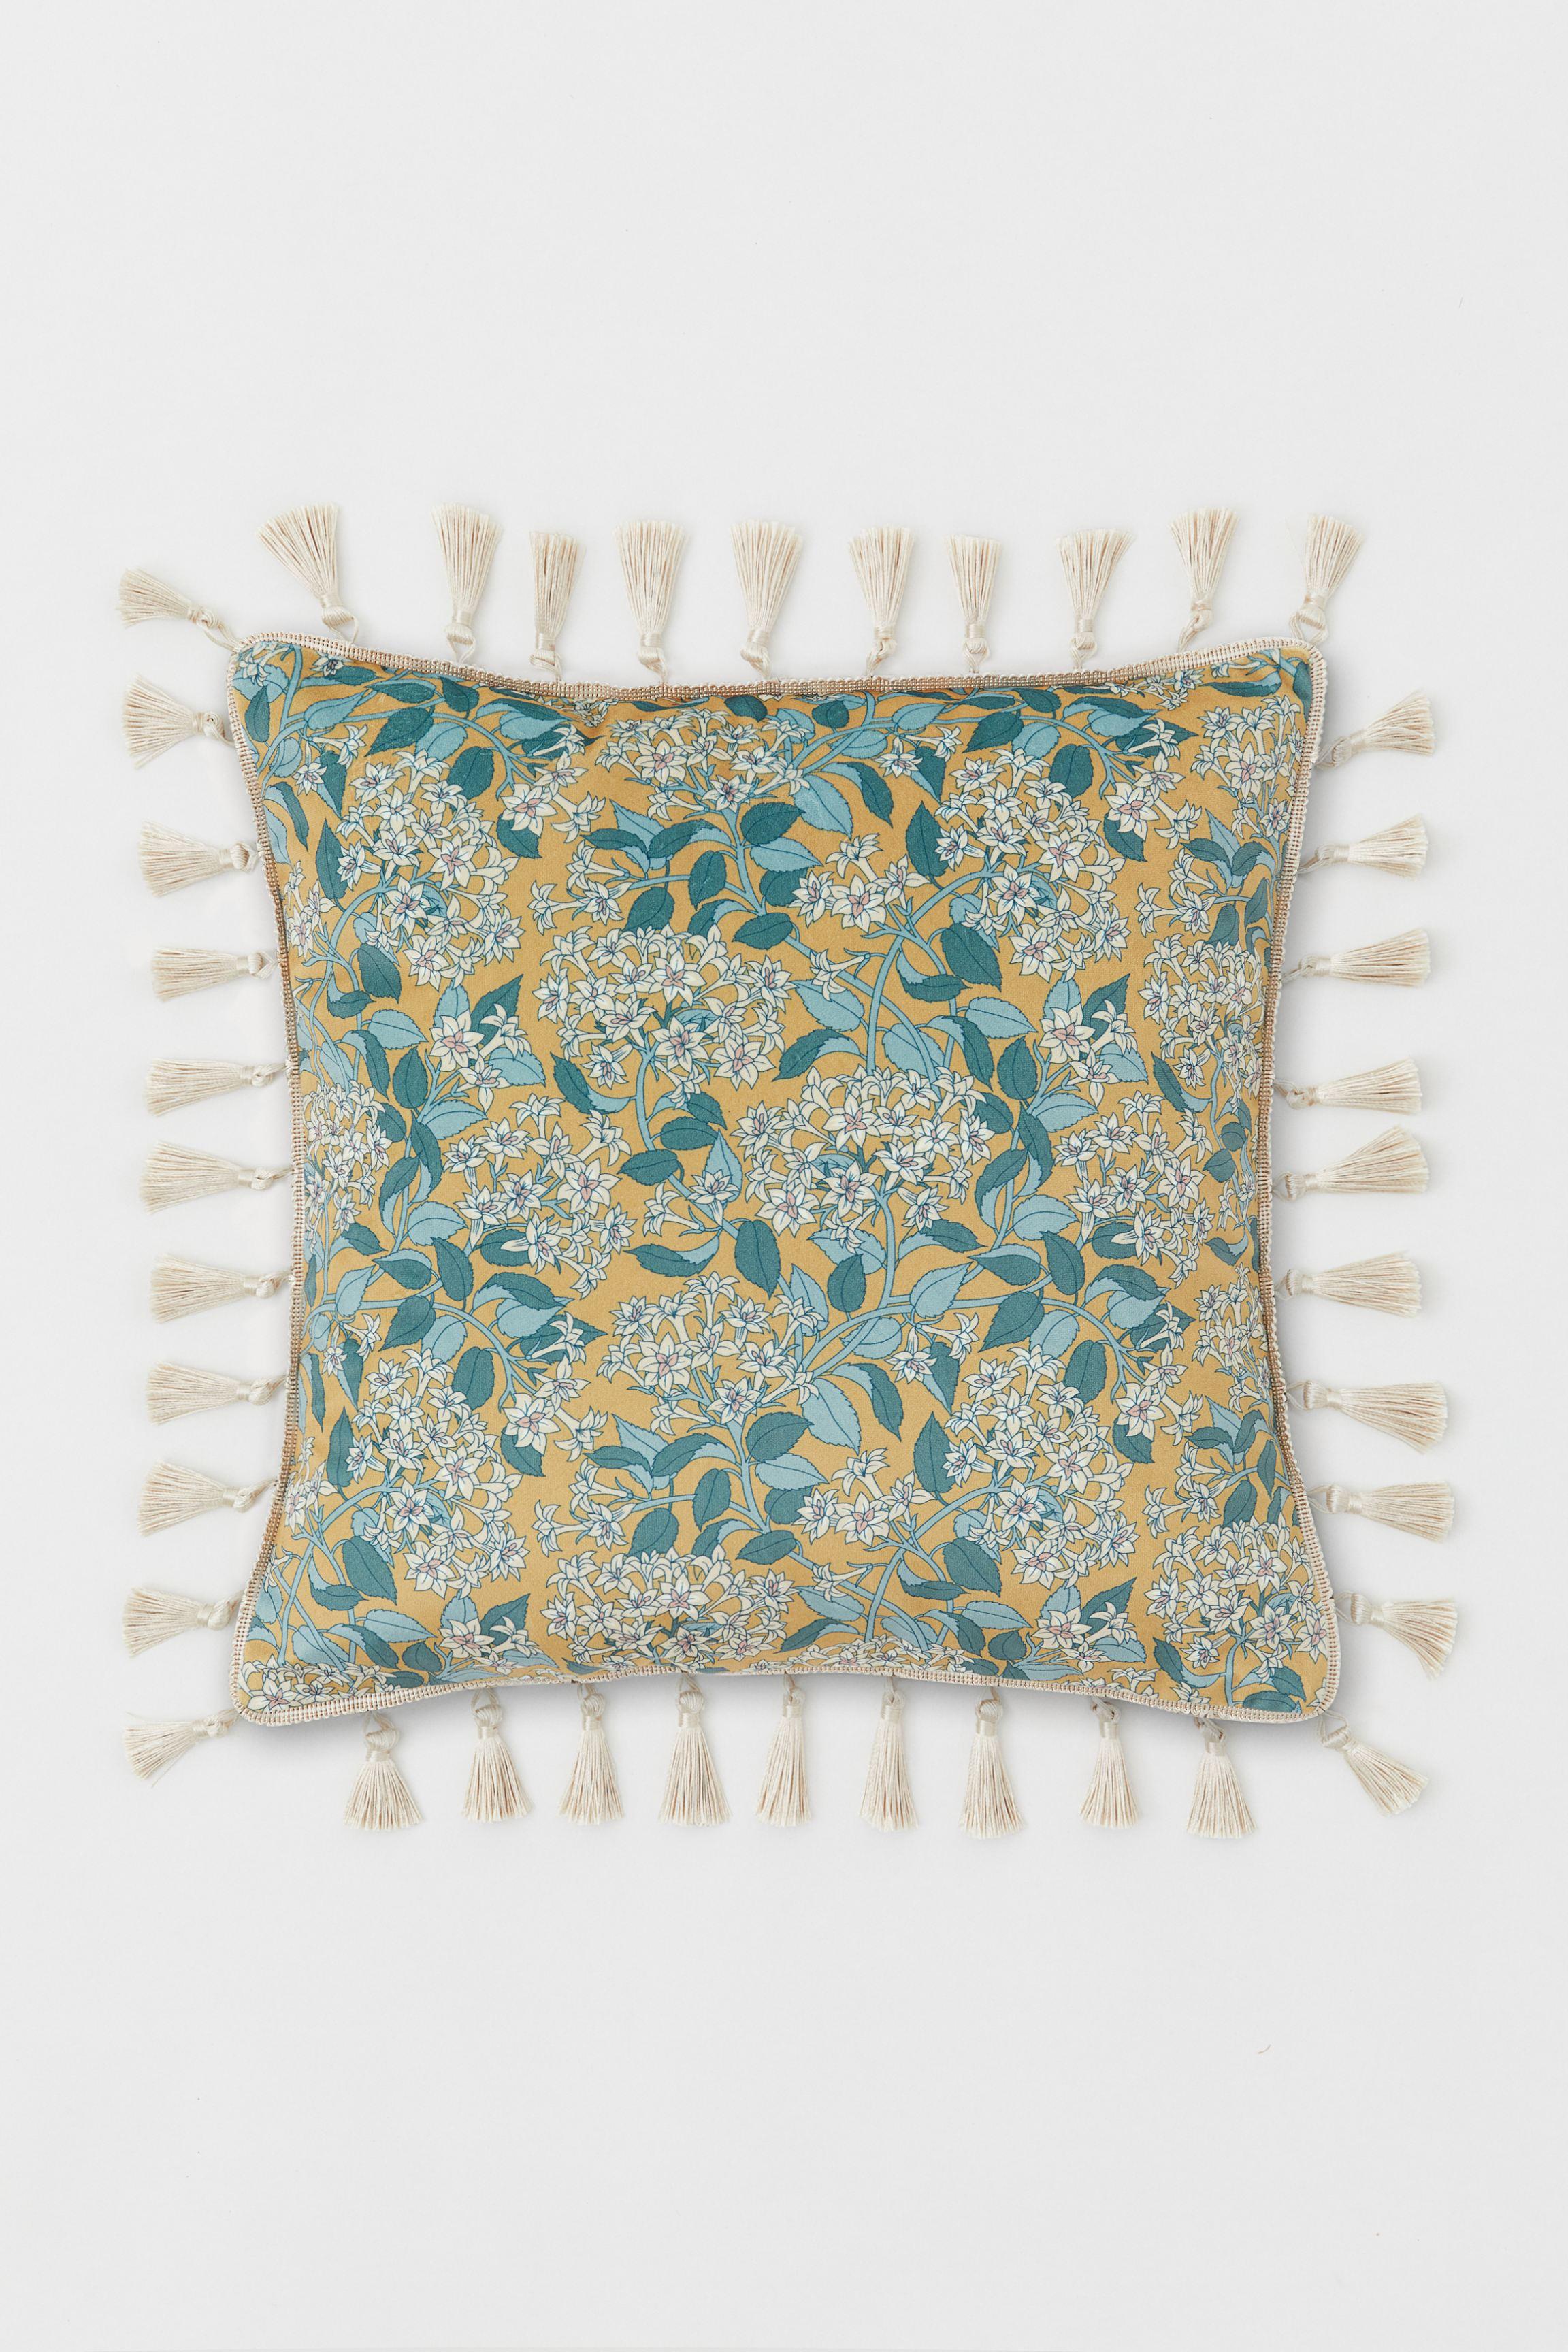 Tasseled Cushion Cover